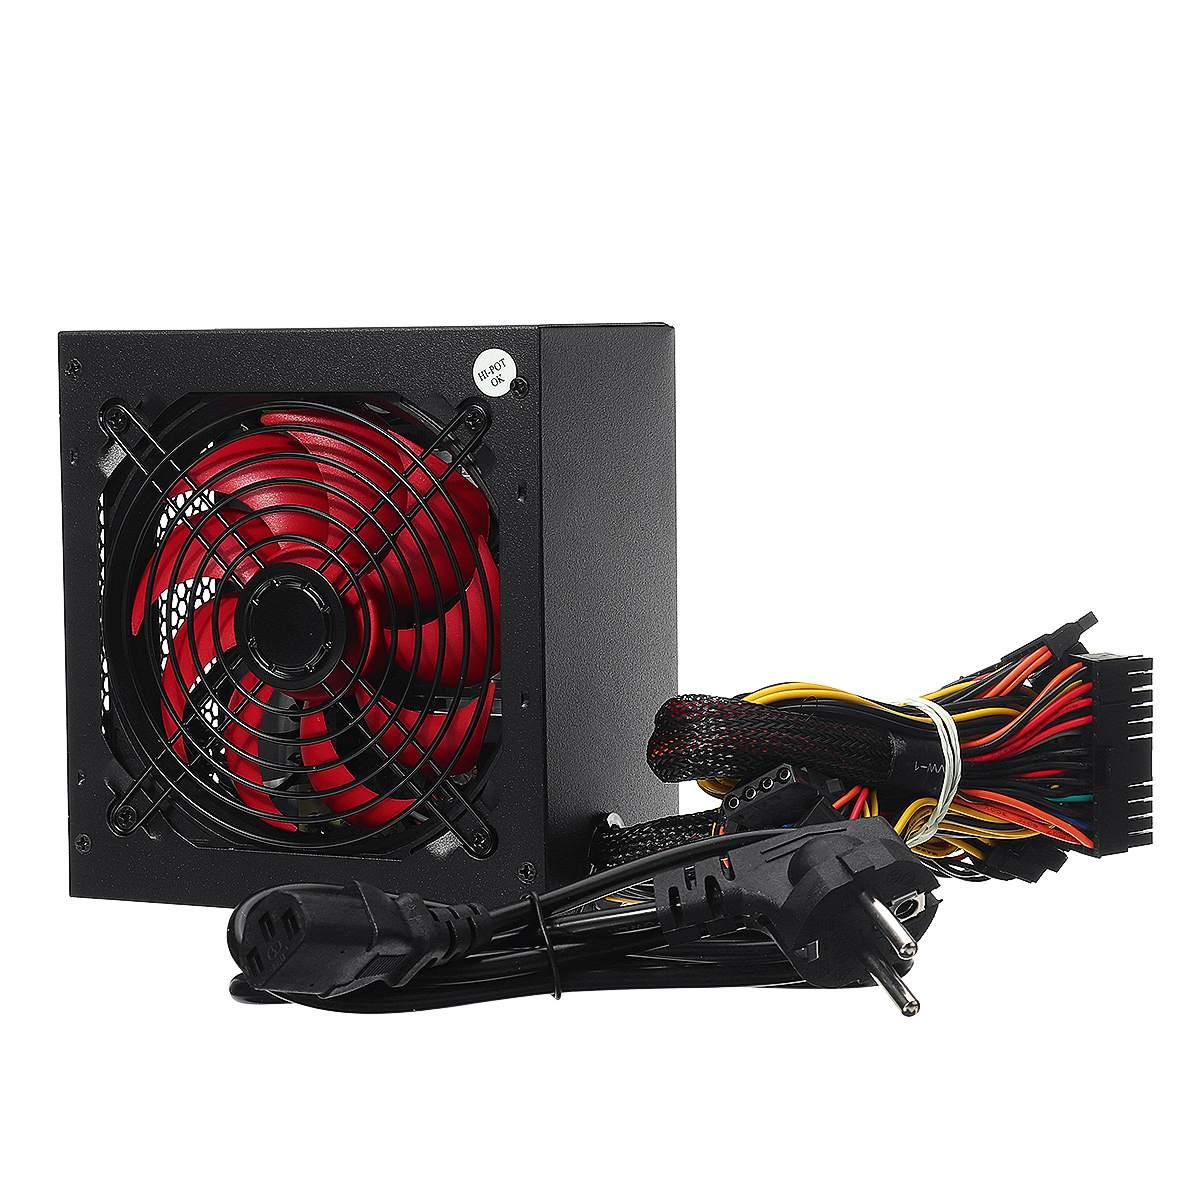 ATX 20/24pin 12V PC Computer SATA Gaming PC Power Supply Passive PFC Silent Fan 650W Power Supply